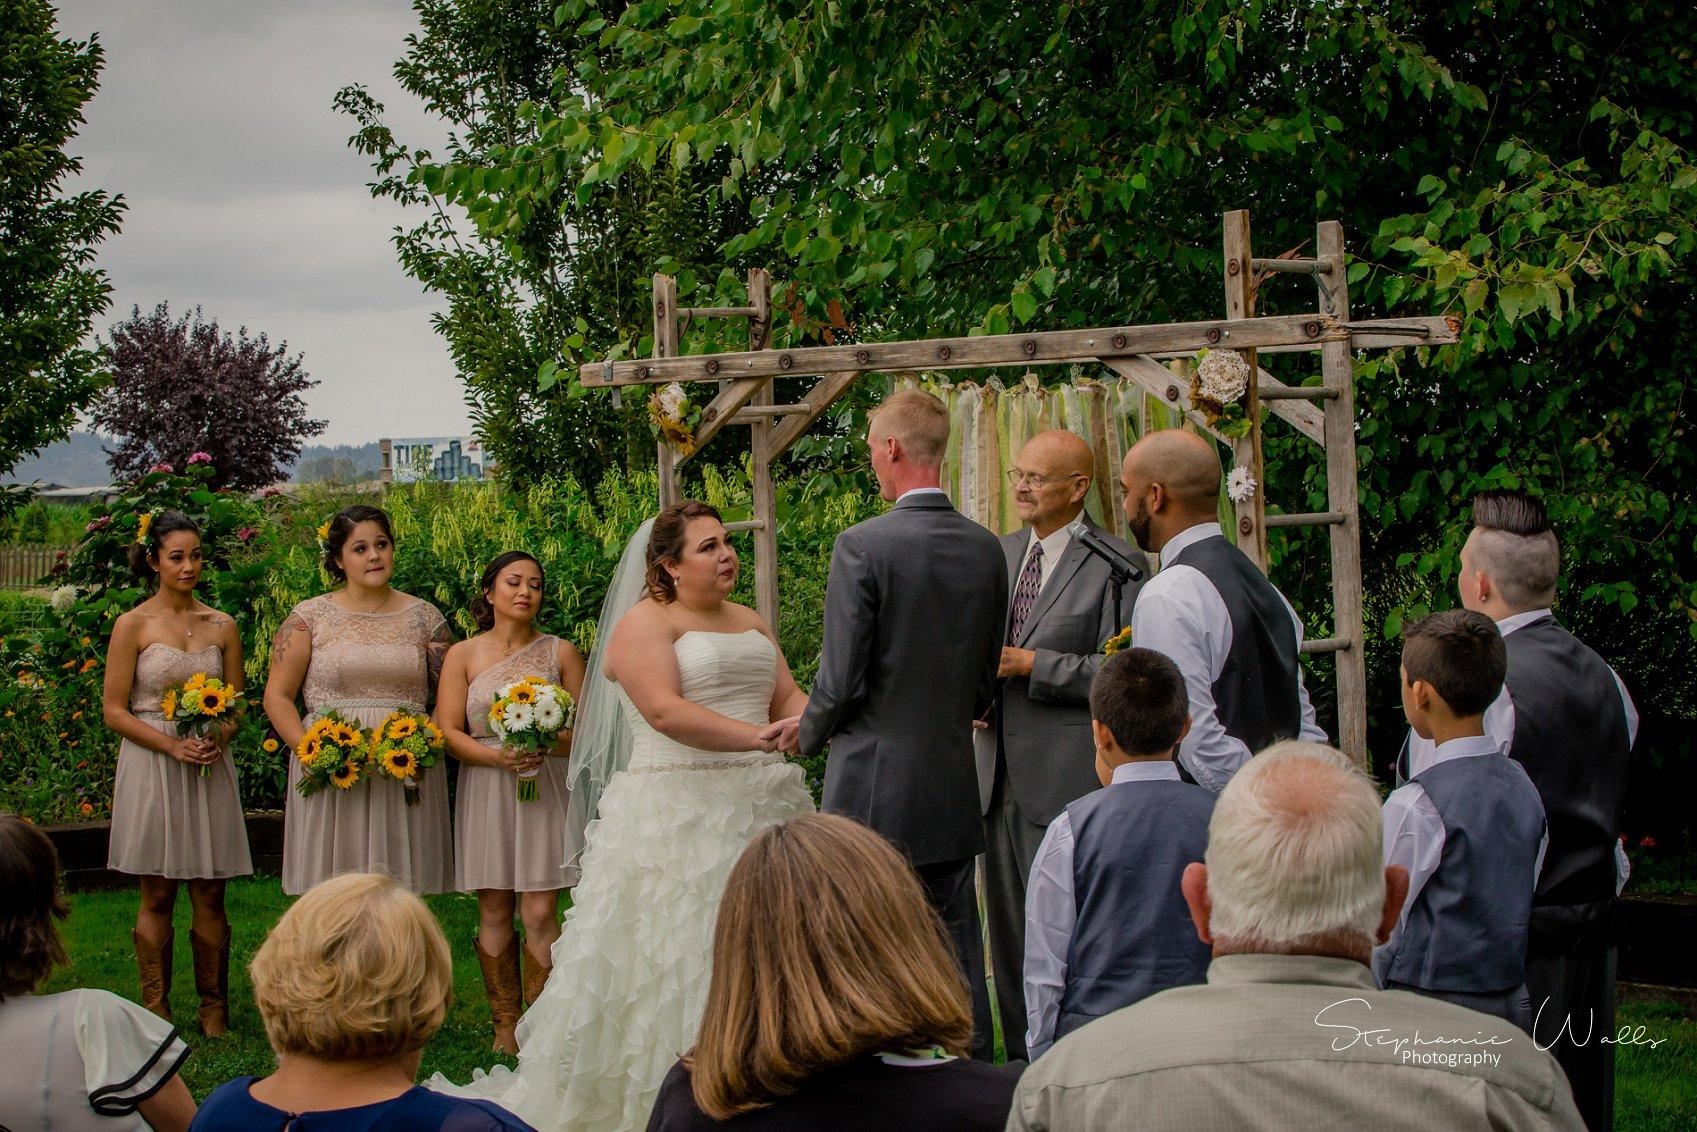 Kimble Wedding 175 Marlena & Allans | Snohomish Red Barn Events (Stocker Farms) | Snohomish, Wa Wedding Photographer